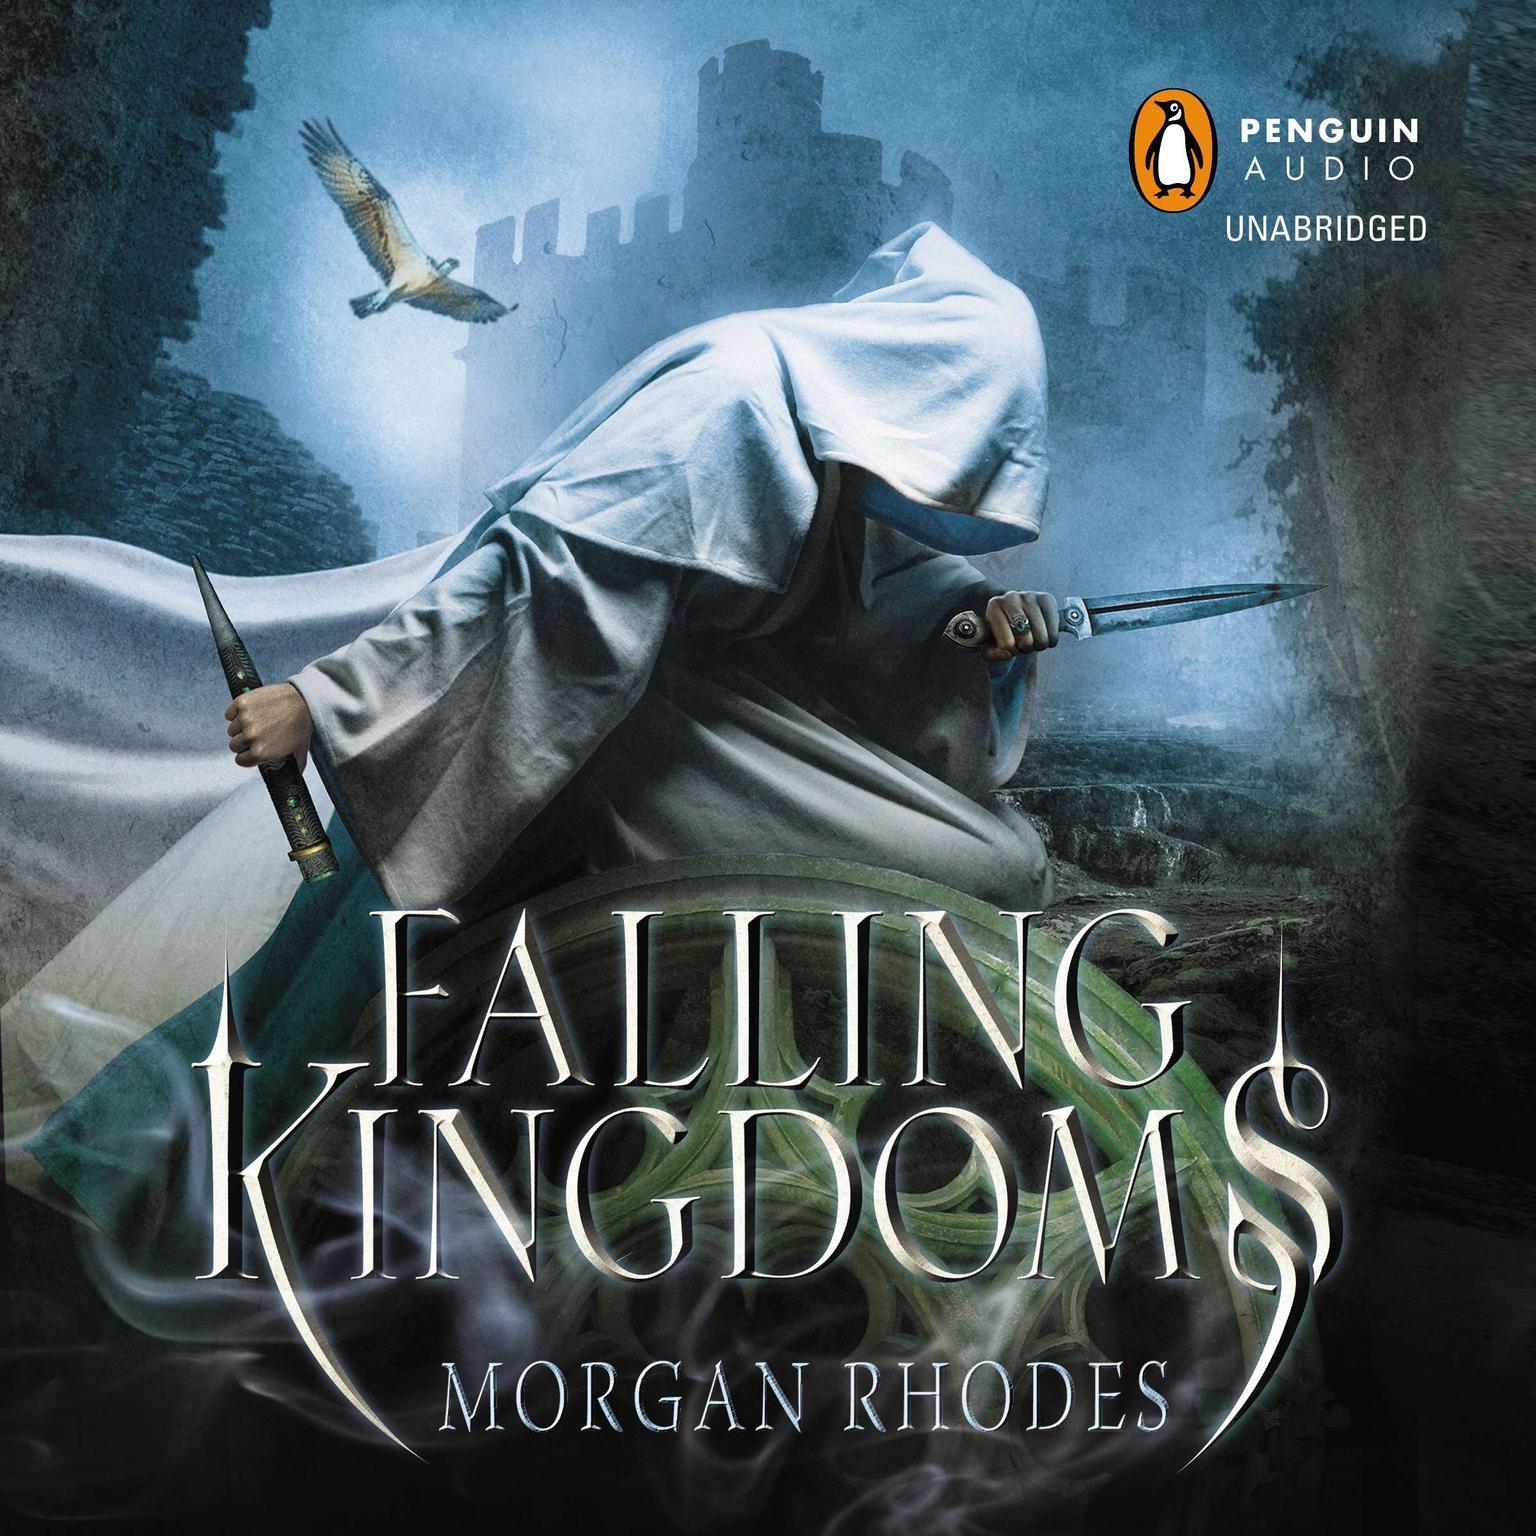 Kingdoms epub falling morgan download rhodes